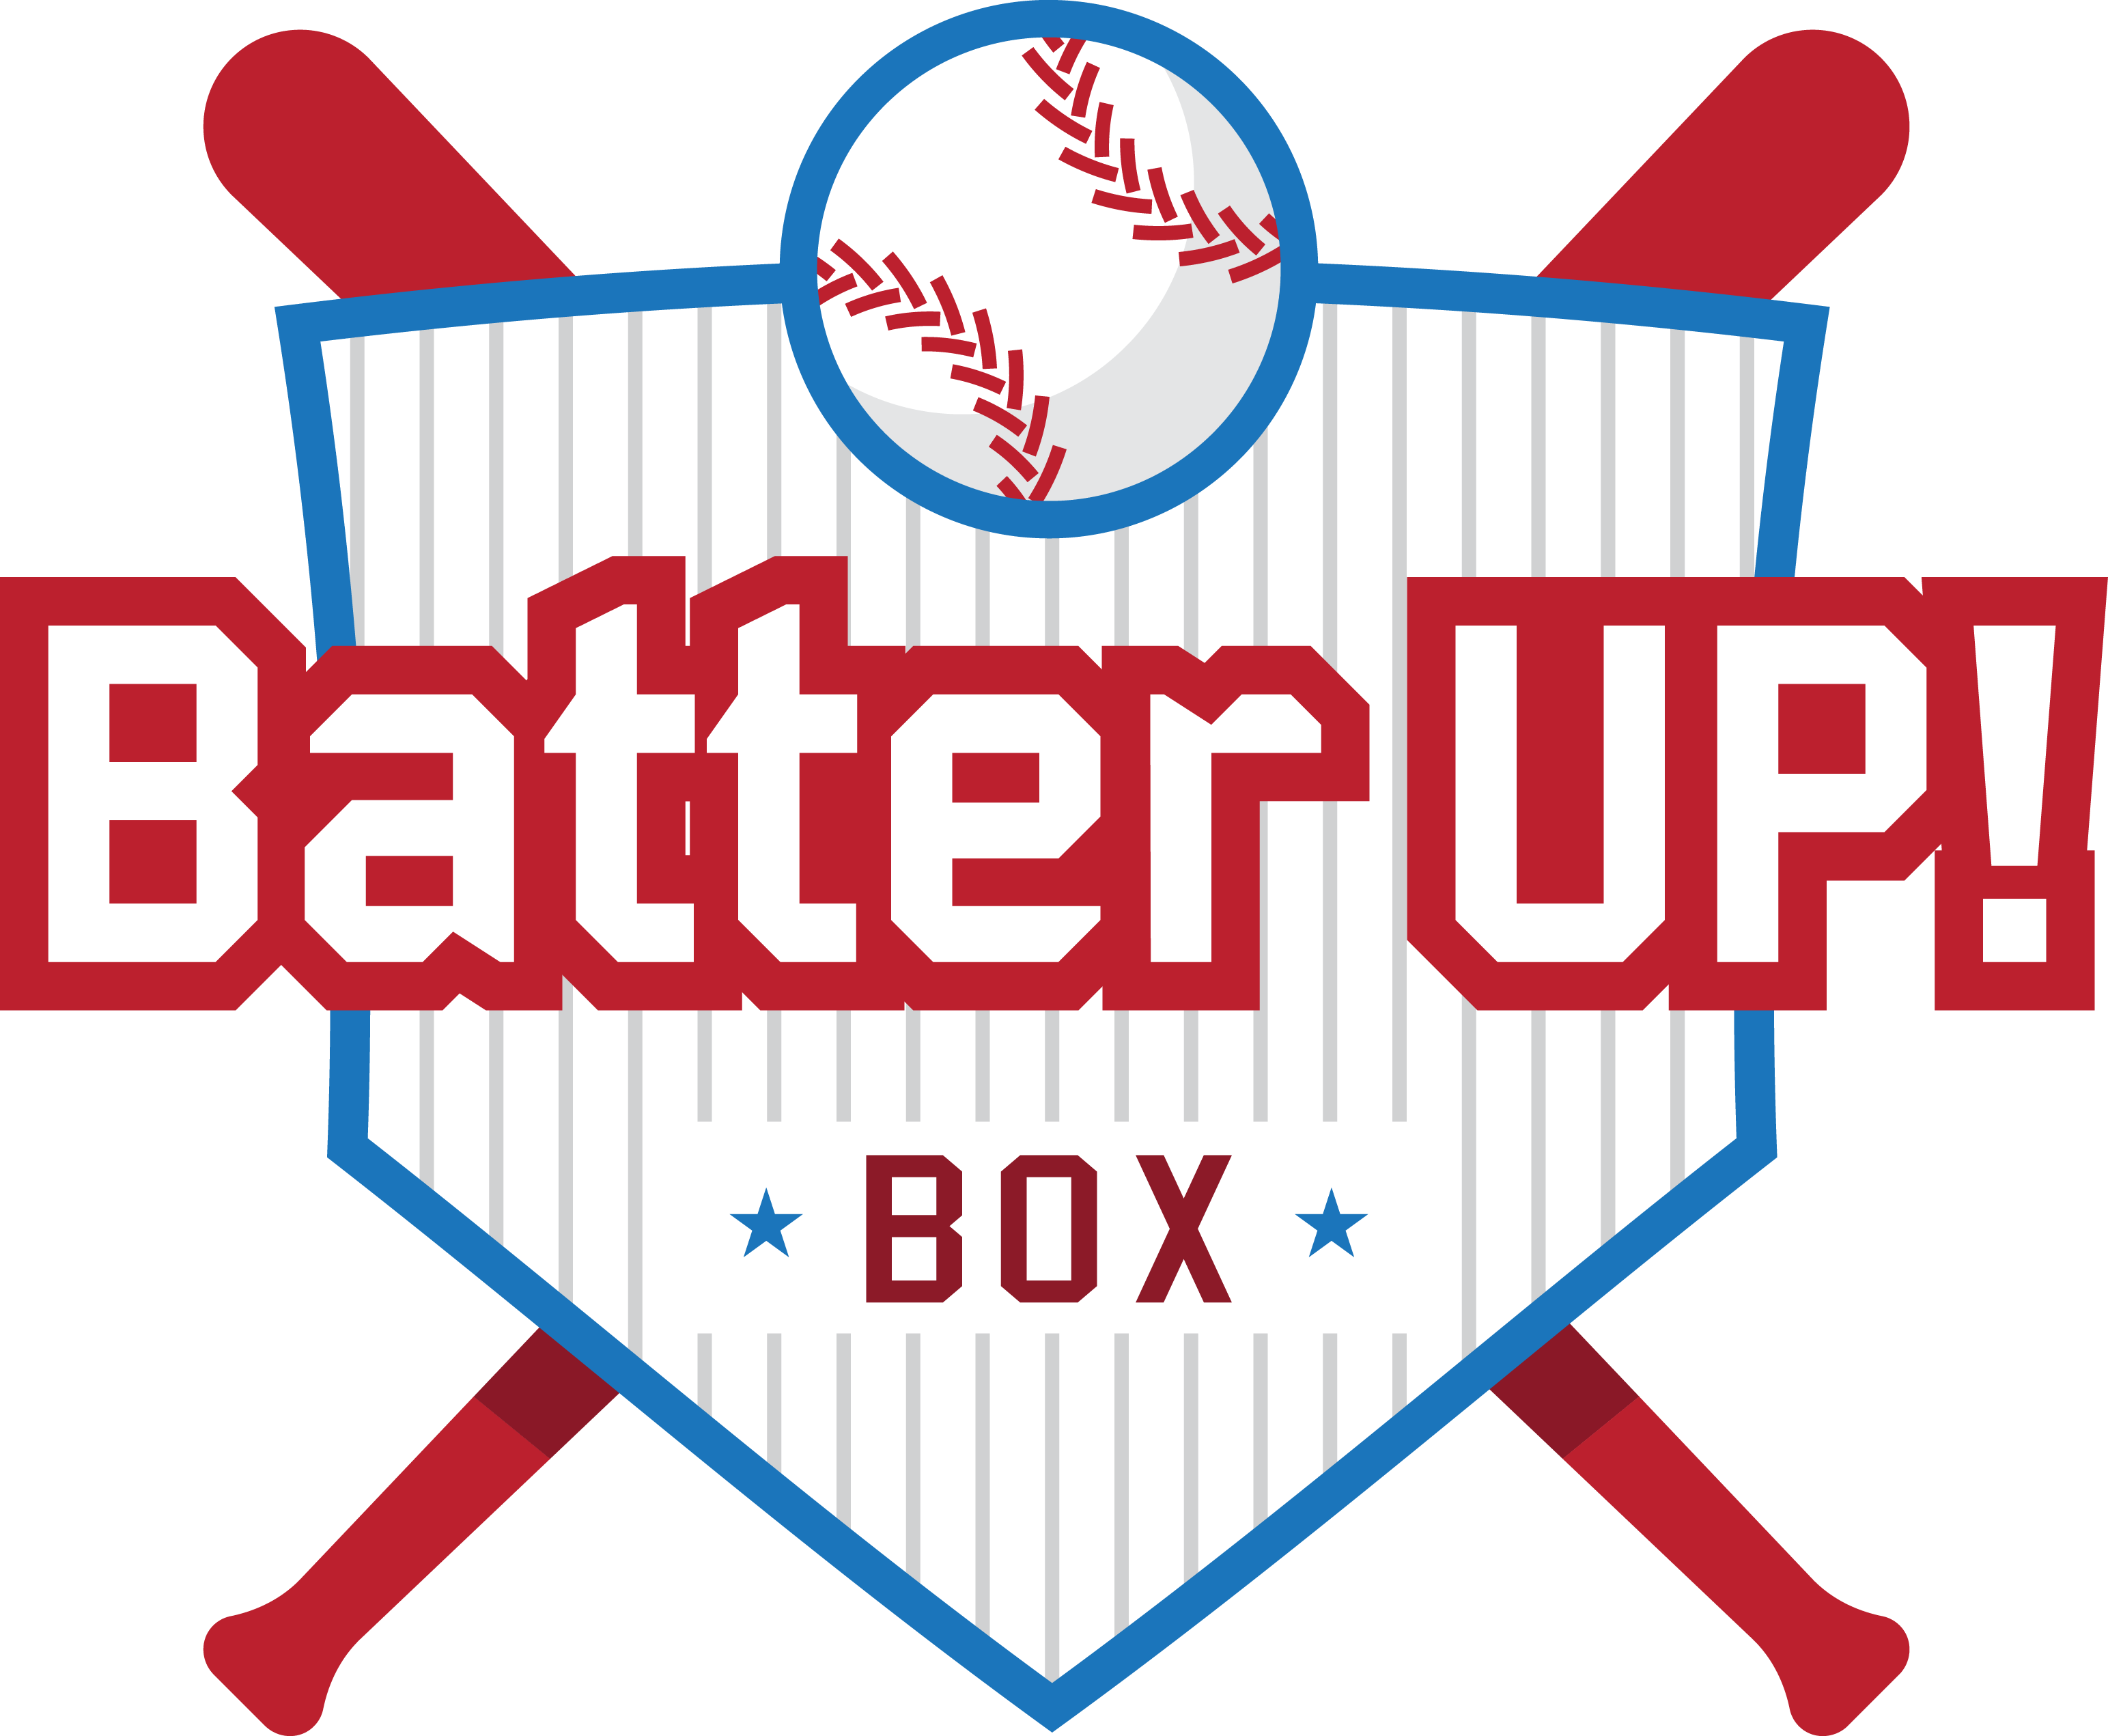 EBSM_ Sports Box Batter Up Transparent